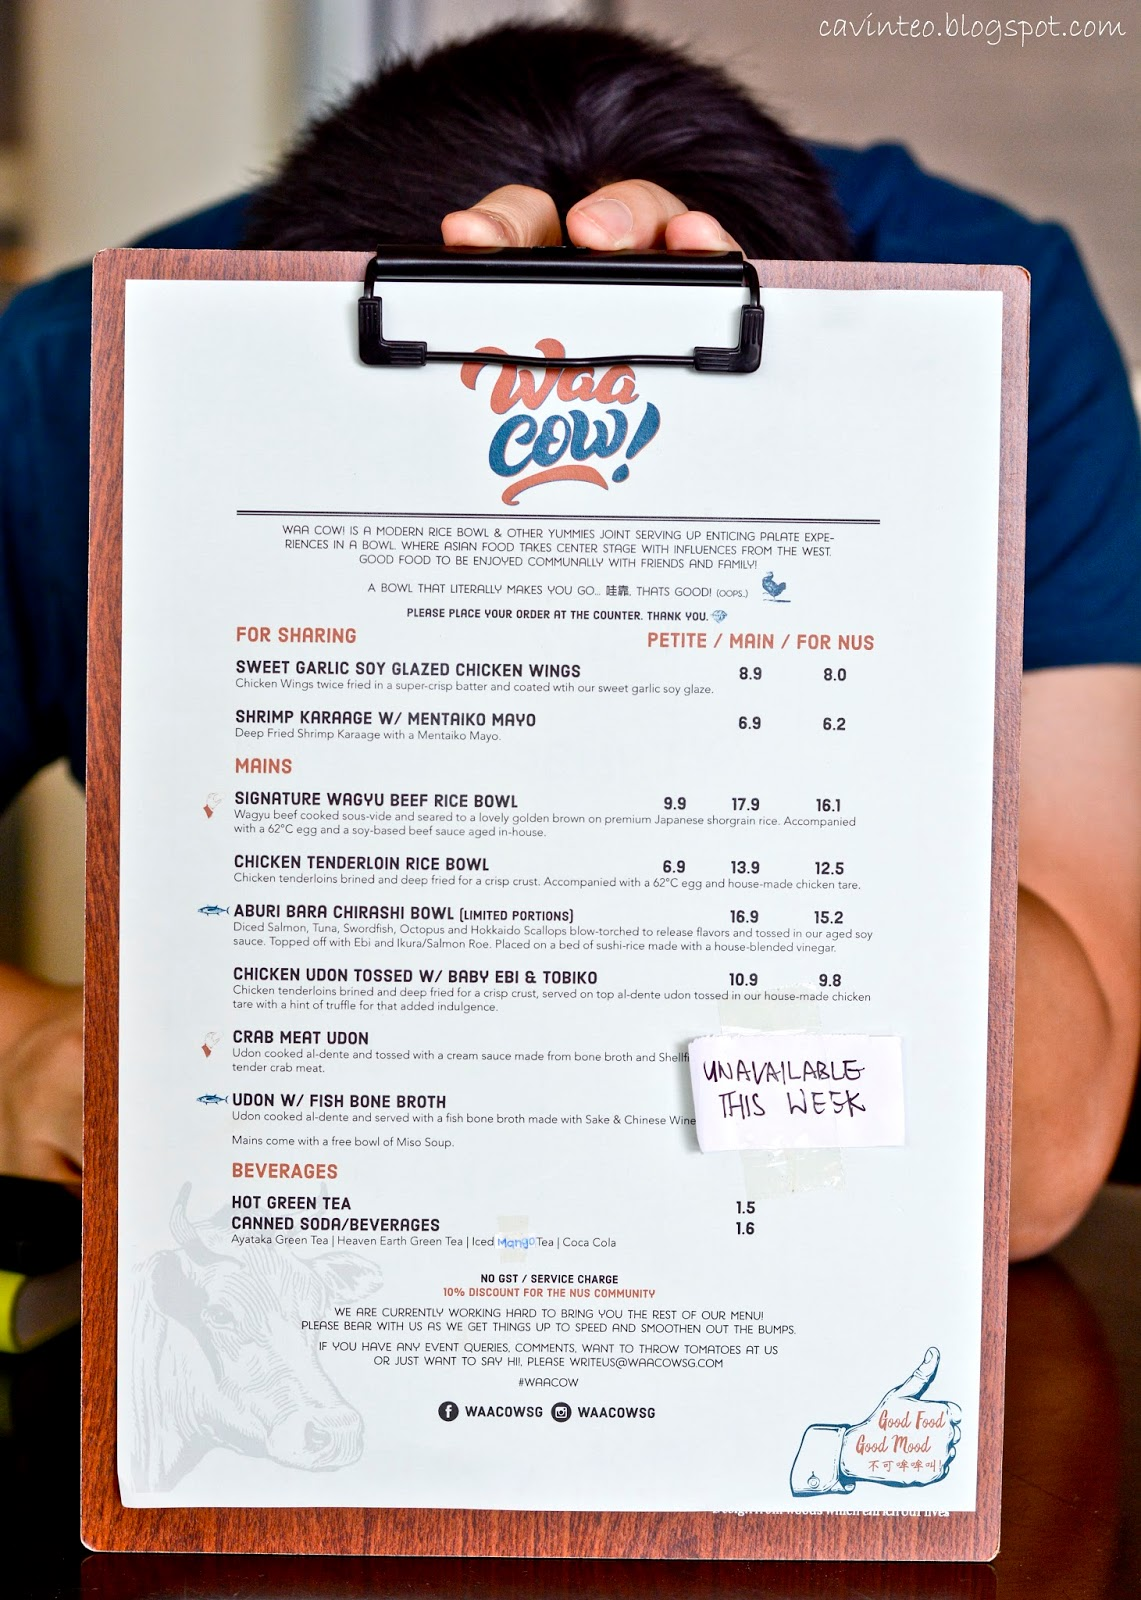 Entree Kibbles: Waa Cow! - Signature Wagyu Beef Rice Bowl